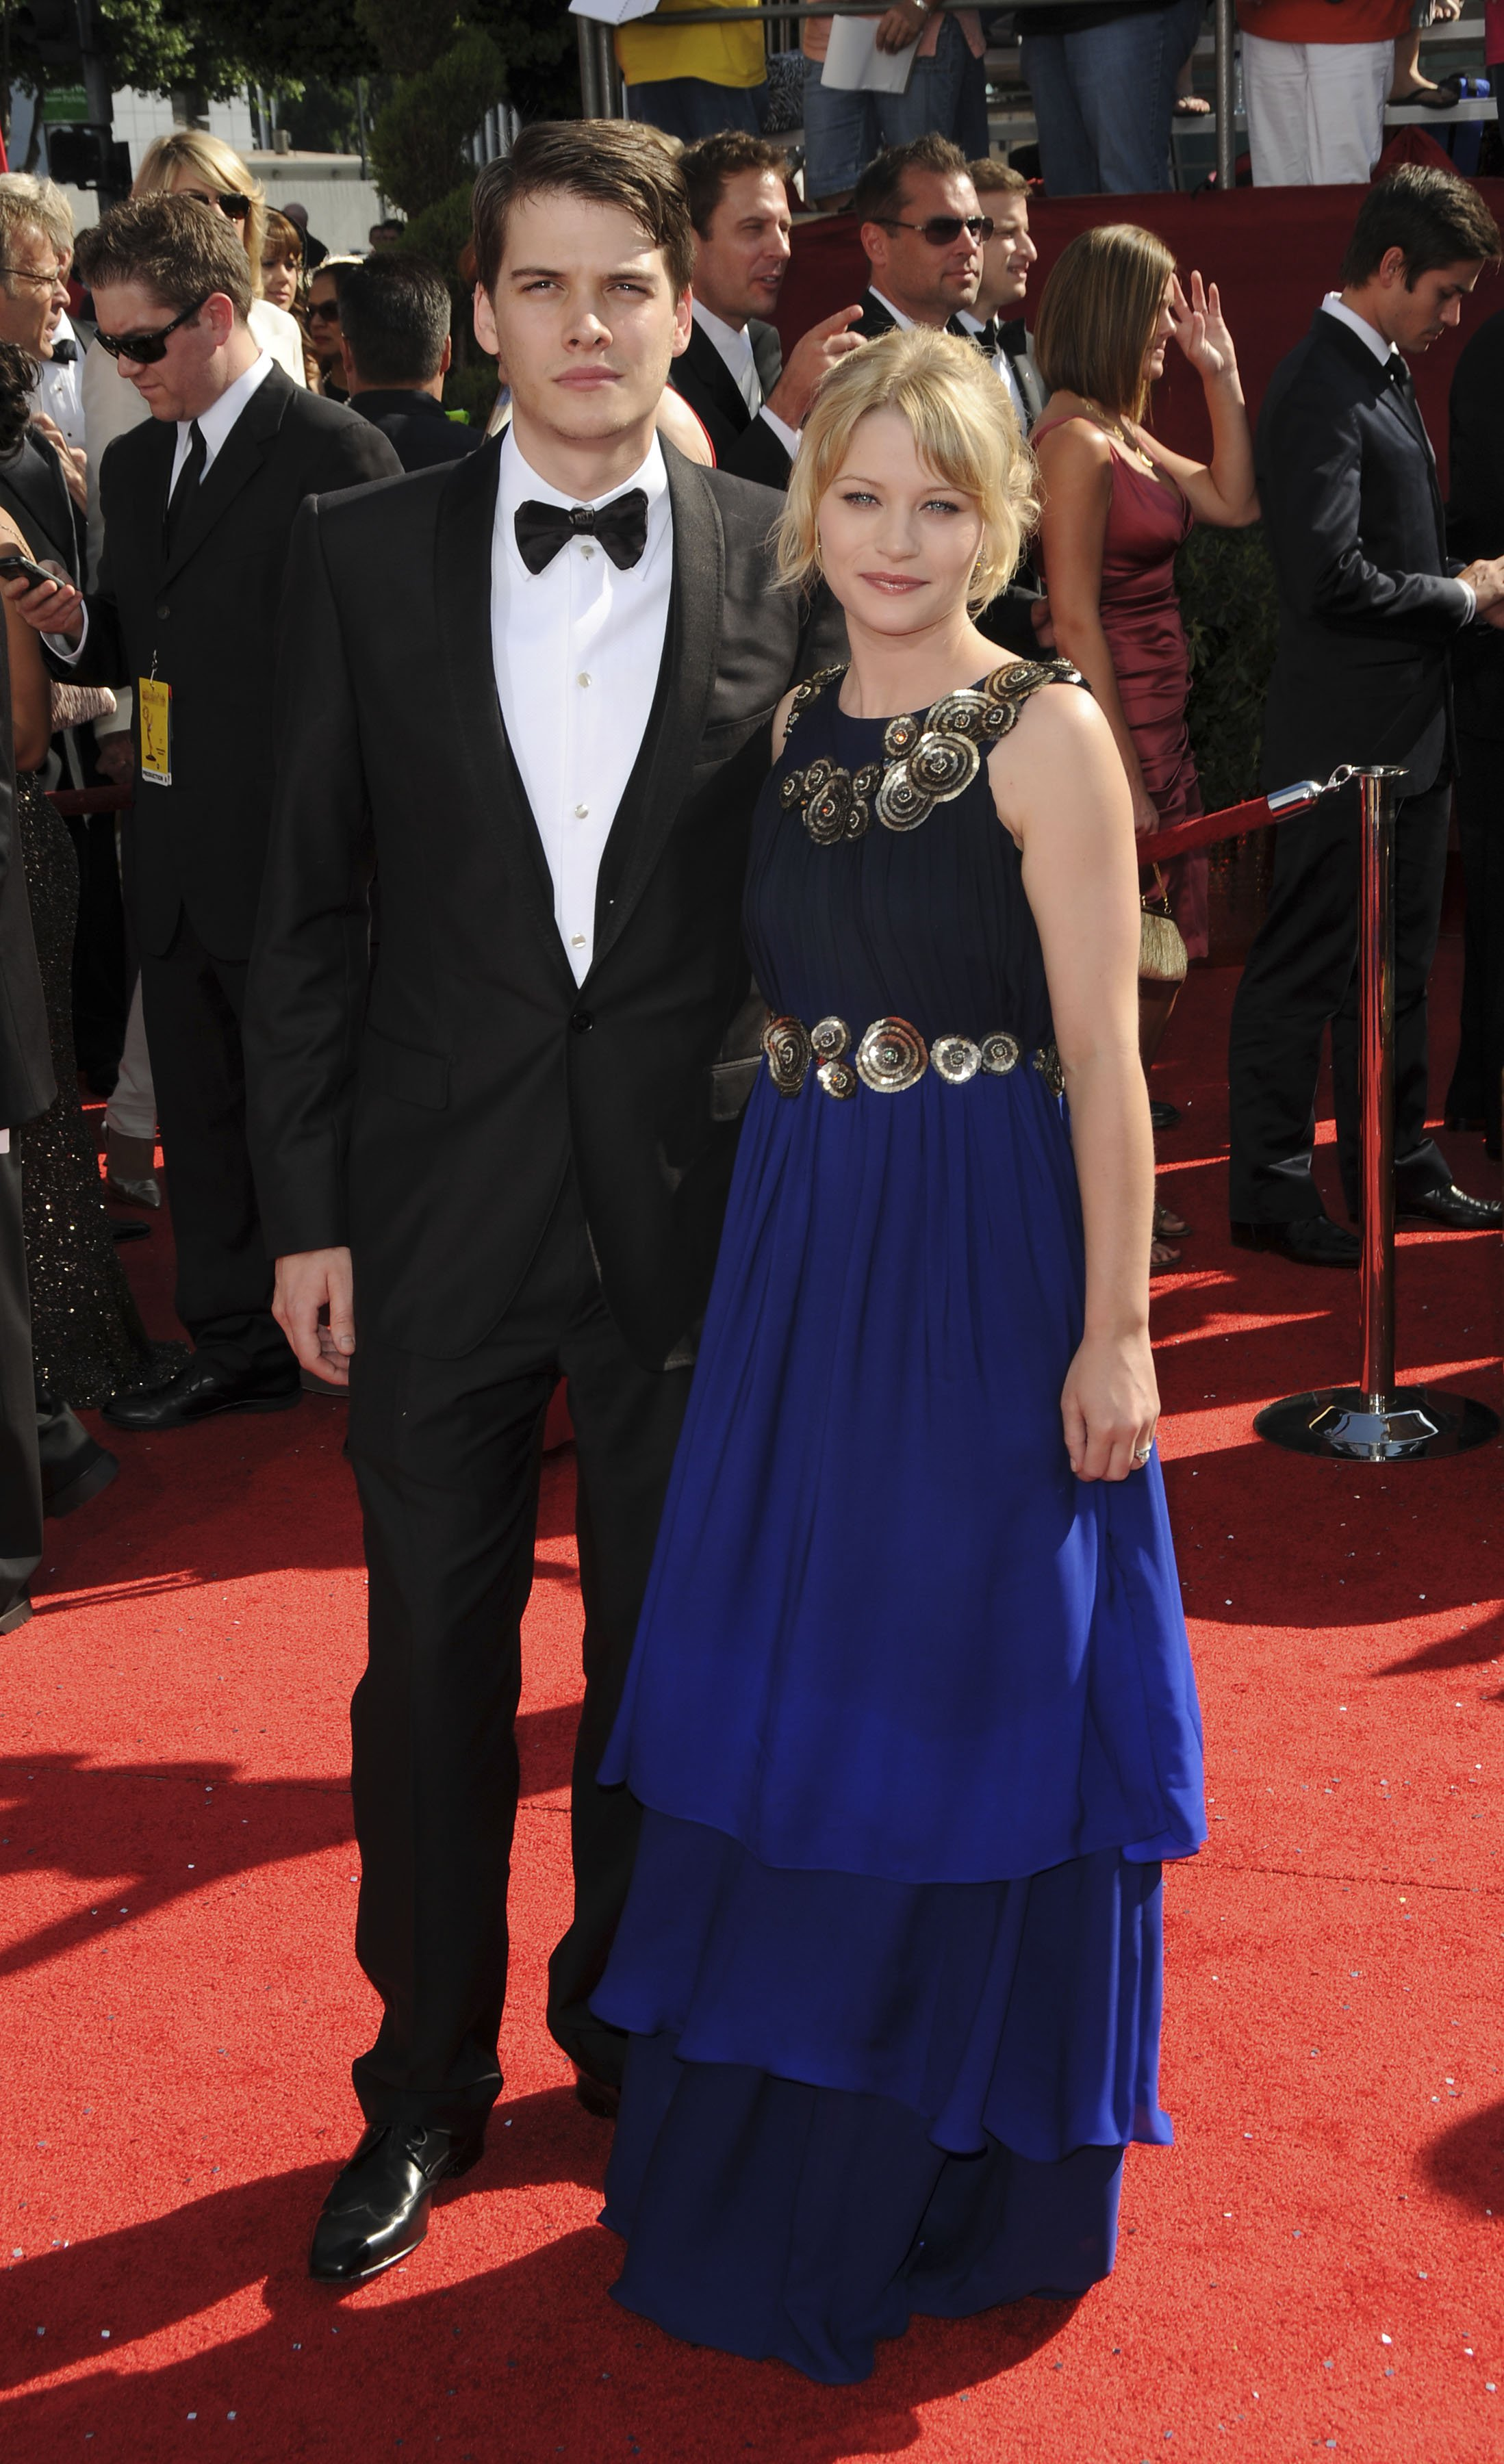 48238_Celebutopia-Emilie_de_Ravin_arrives_at_the_60th_Annual_Primetime_Emmy_Awards-04_122_380lo.JPG